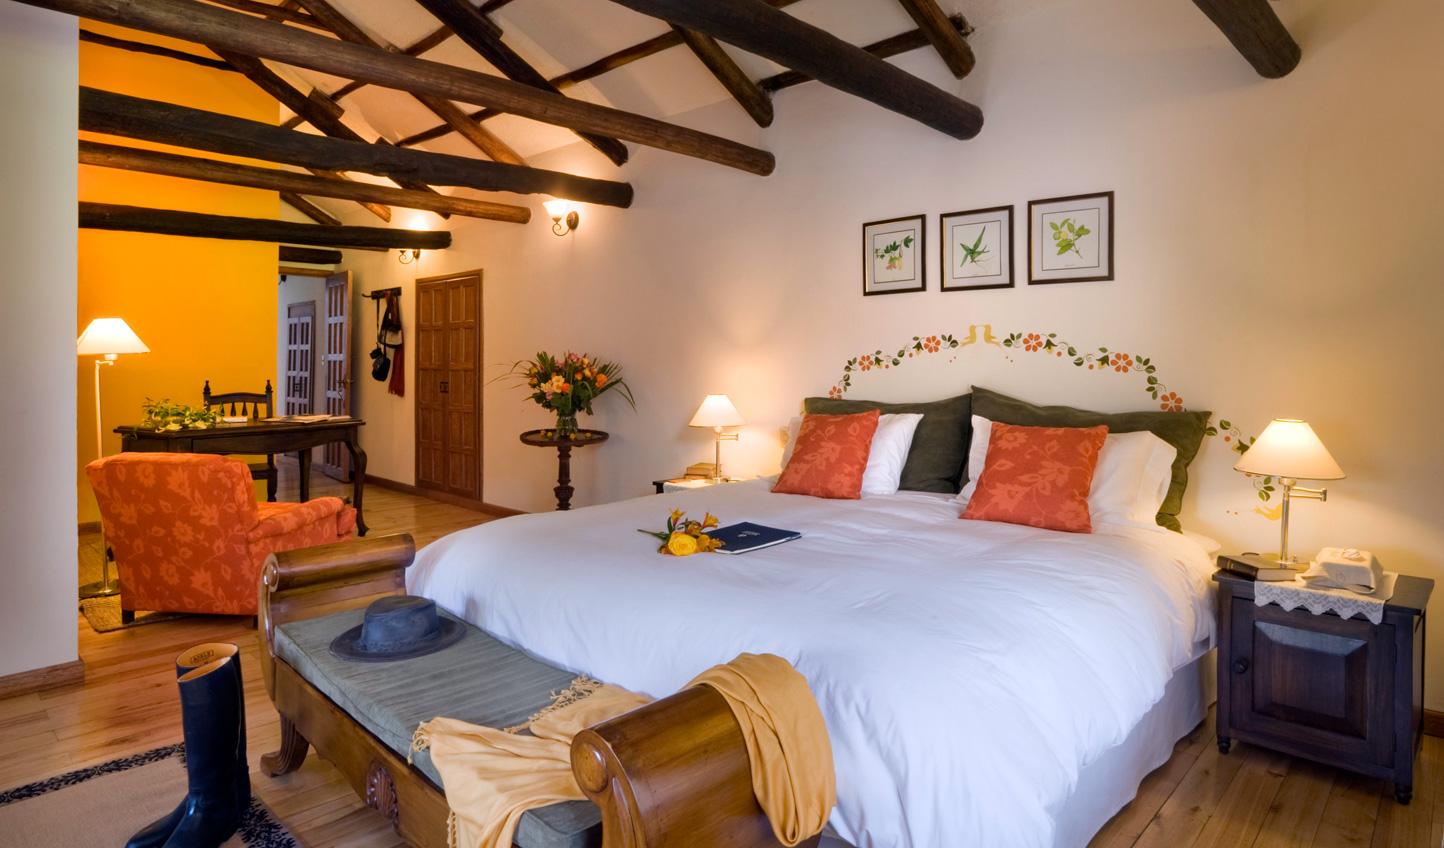 Traditional South American hacienda decor